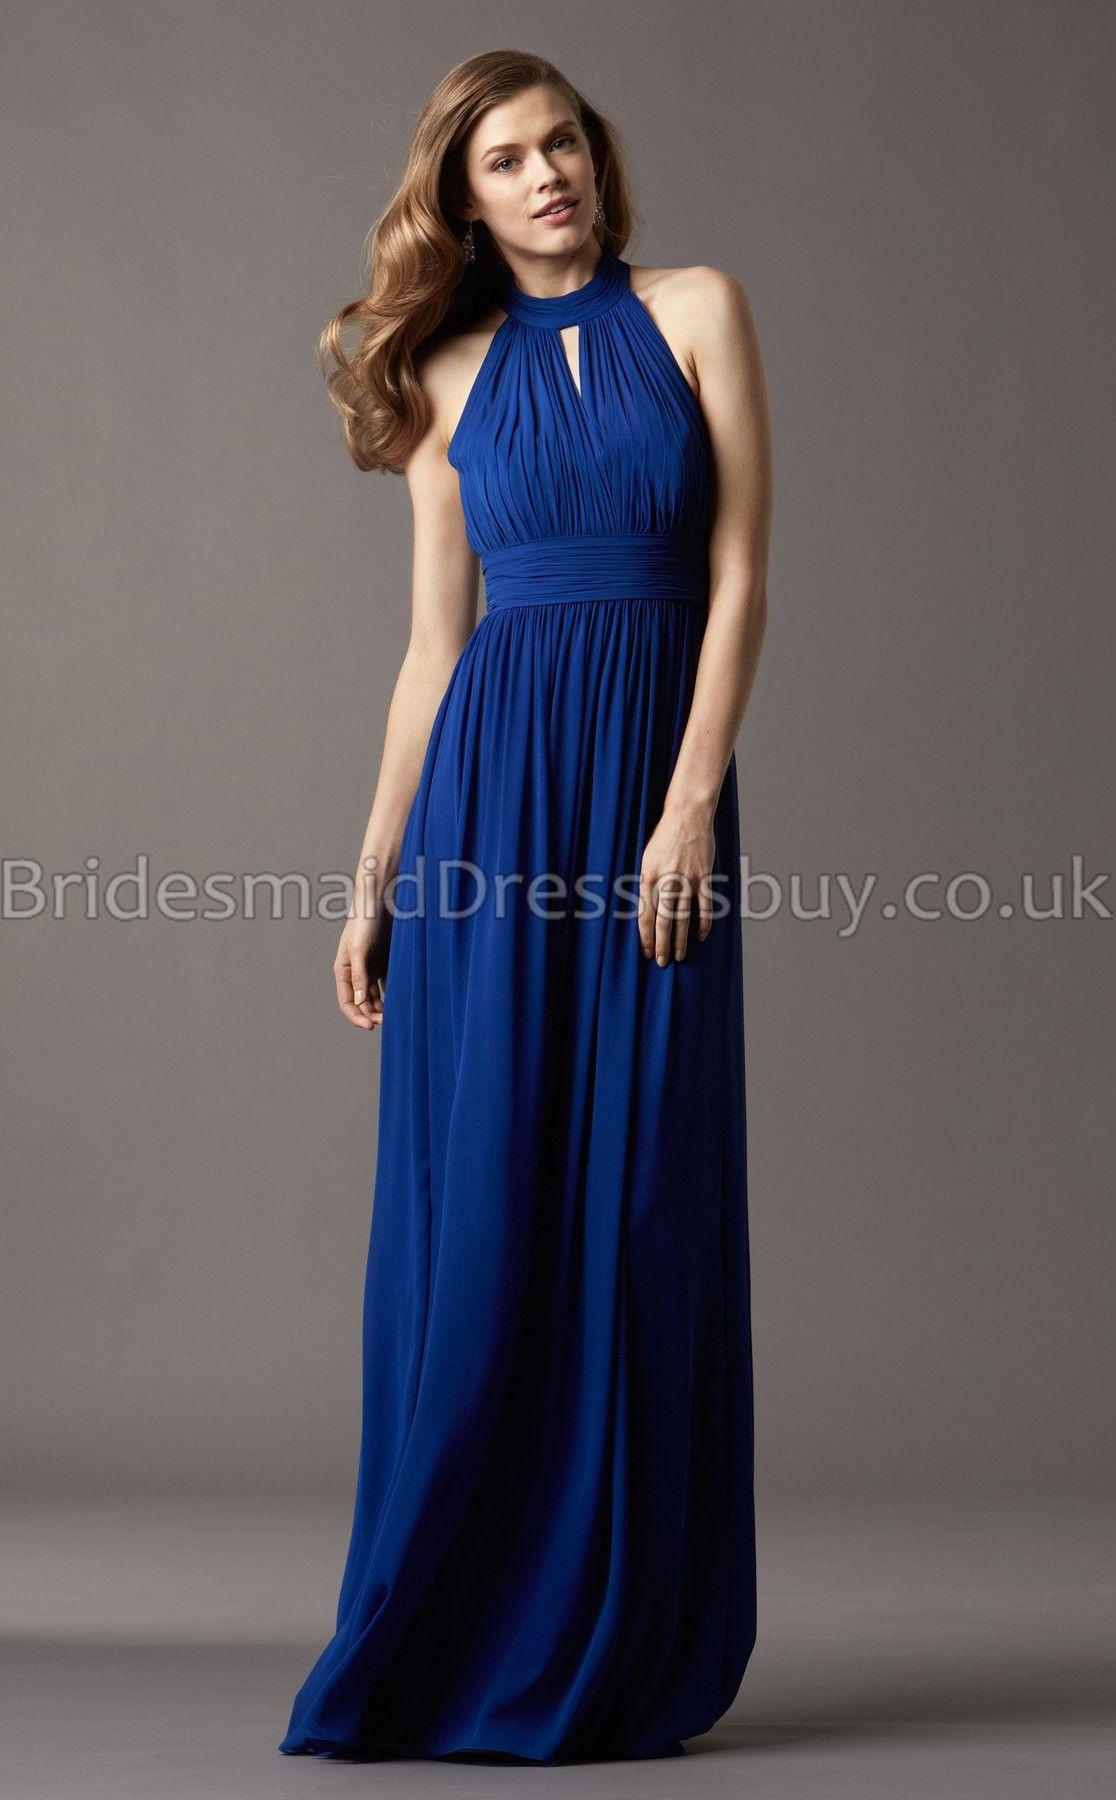 Royal blue long bridesmaid dressesblue bridesmaid dresses royal blue long bridesmaid dressesblue bridesmaid dresses ombrellifo Images